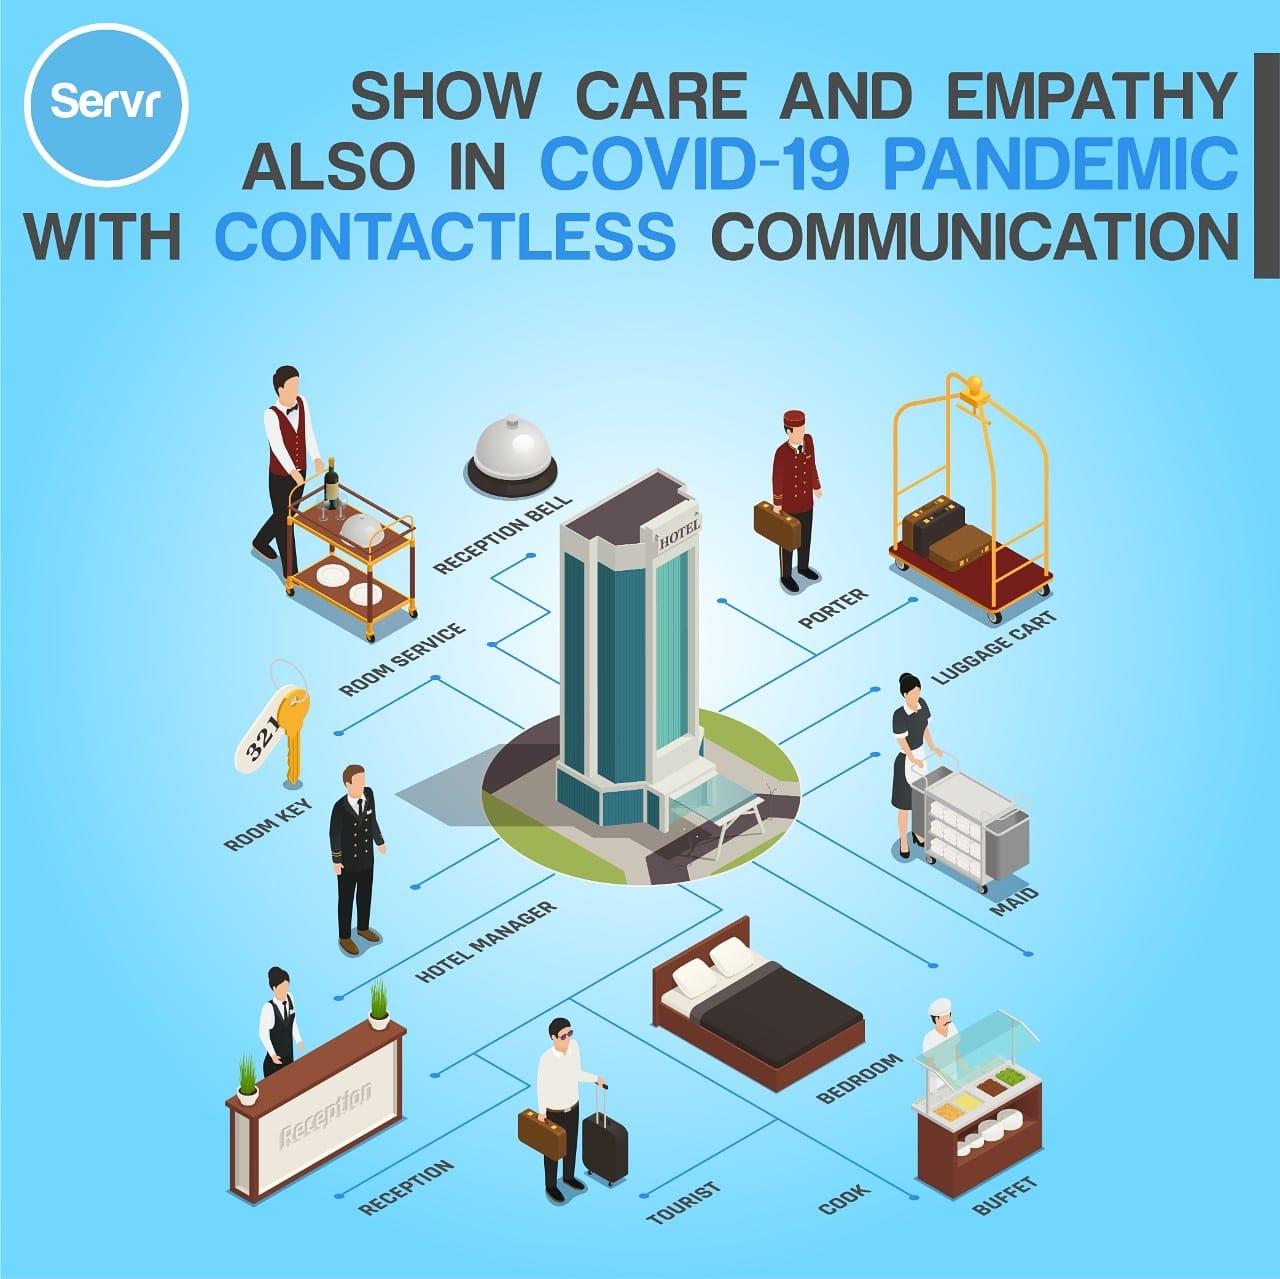 Contact less Communication